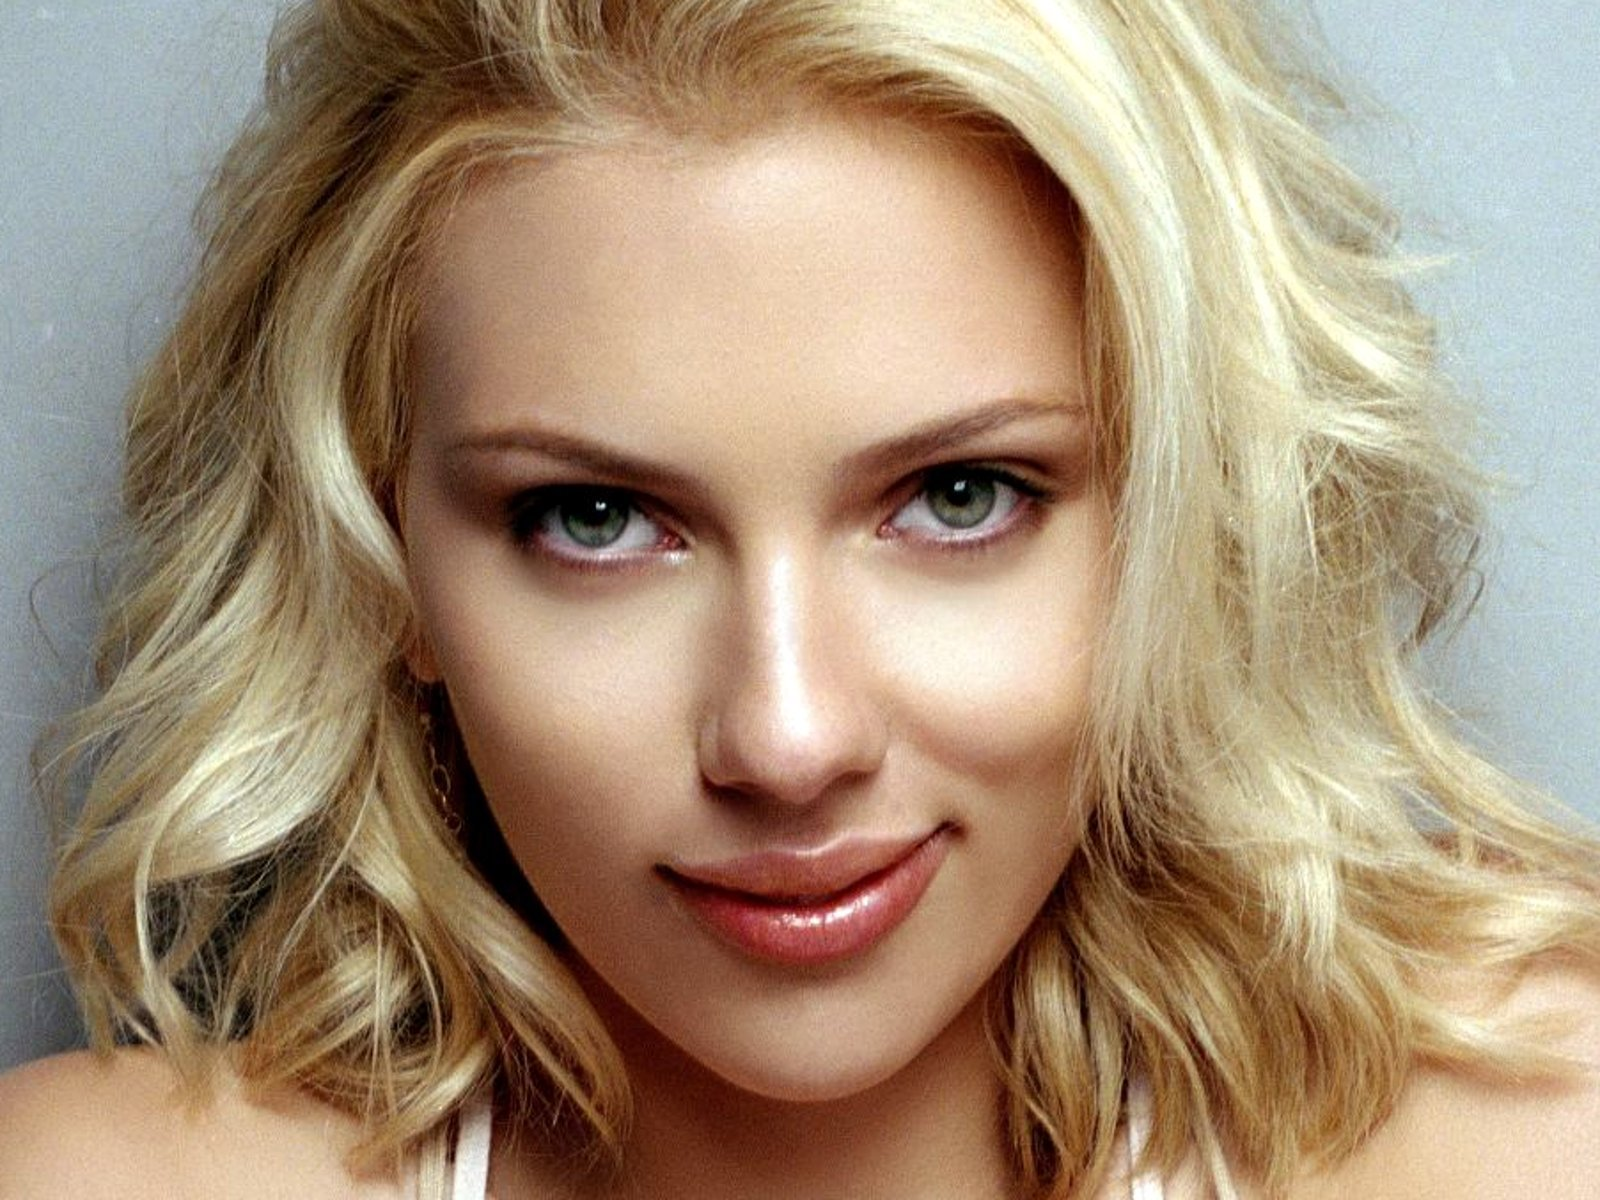 http://3.bp.blogspot.com/-9ShUzIVrCKM/UUJMK-tKgiI/AAAAAAAAFCc/CVfnFlNS2YQ/s1600/Scarlett+Johansson+Wallpaper+2013-6.jpg